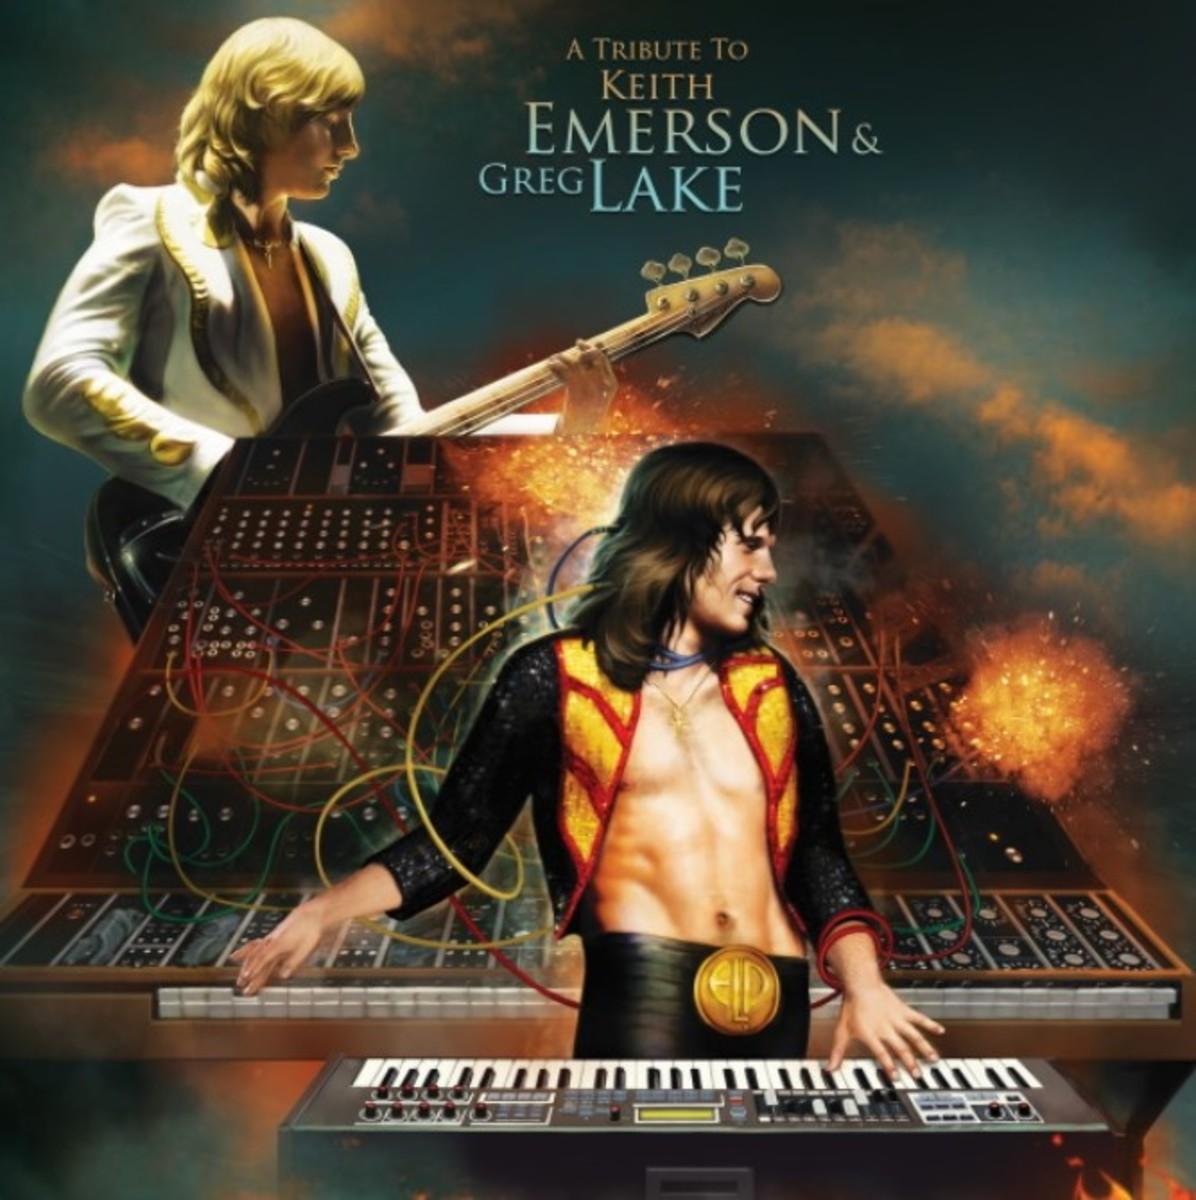 Darryl Emerson Lake